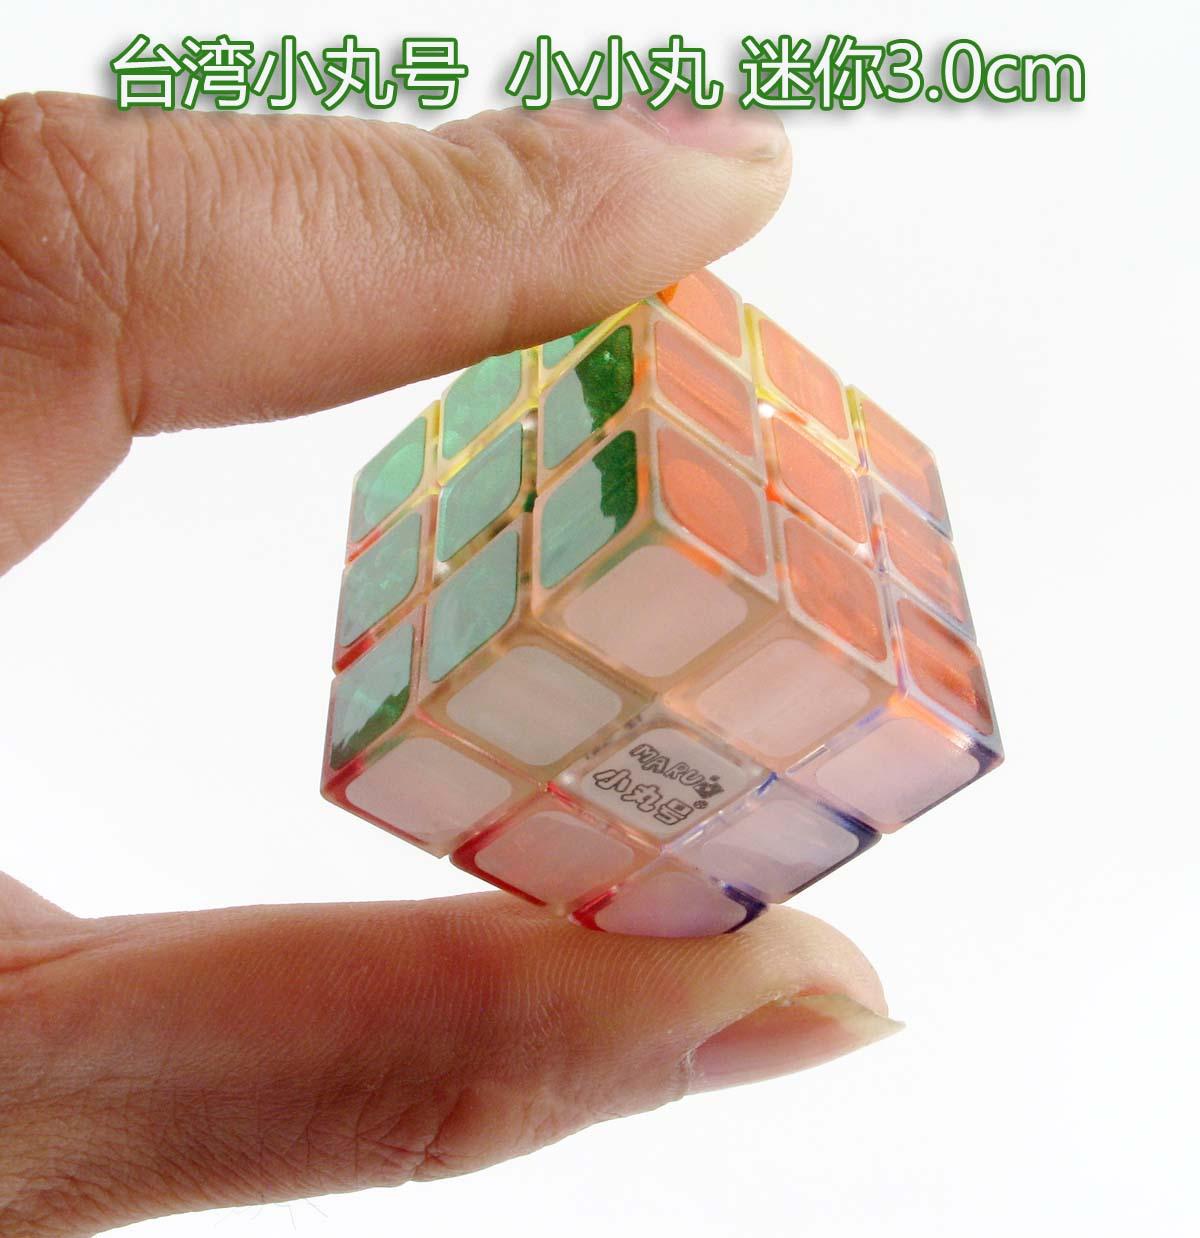 2016 3x3x3 Brinquedos Meninos Educativos Balls Pellets Mini 3 Belt Keychain Magic Cube 3.0cm Accessories On Sale Di008(China (Mainland))